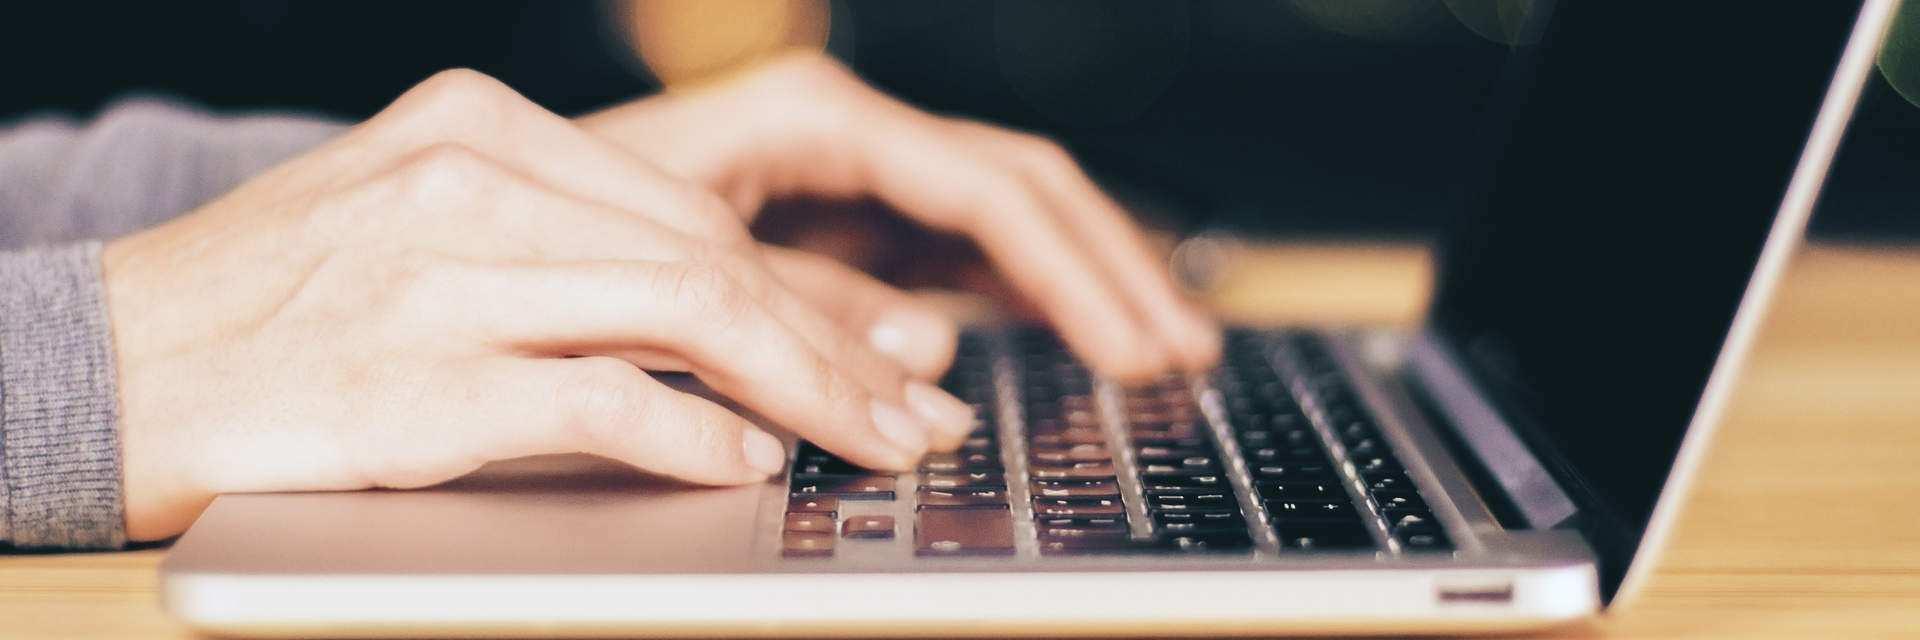 Kontaktformular Auf Webseiten Datenschutzexperte De